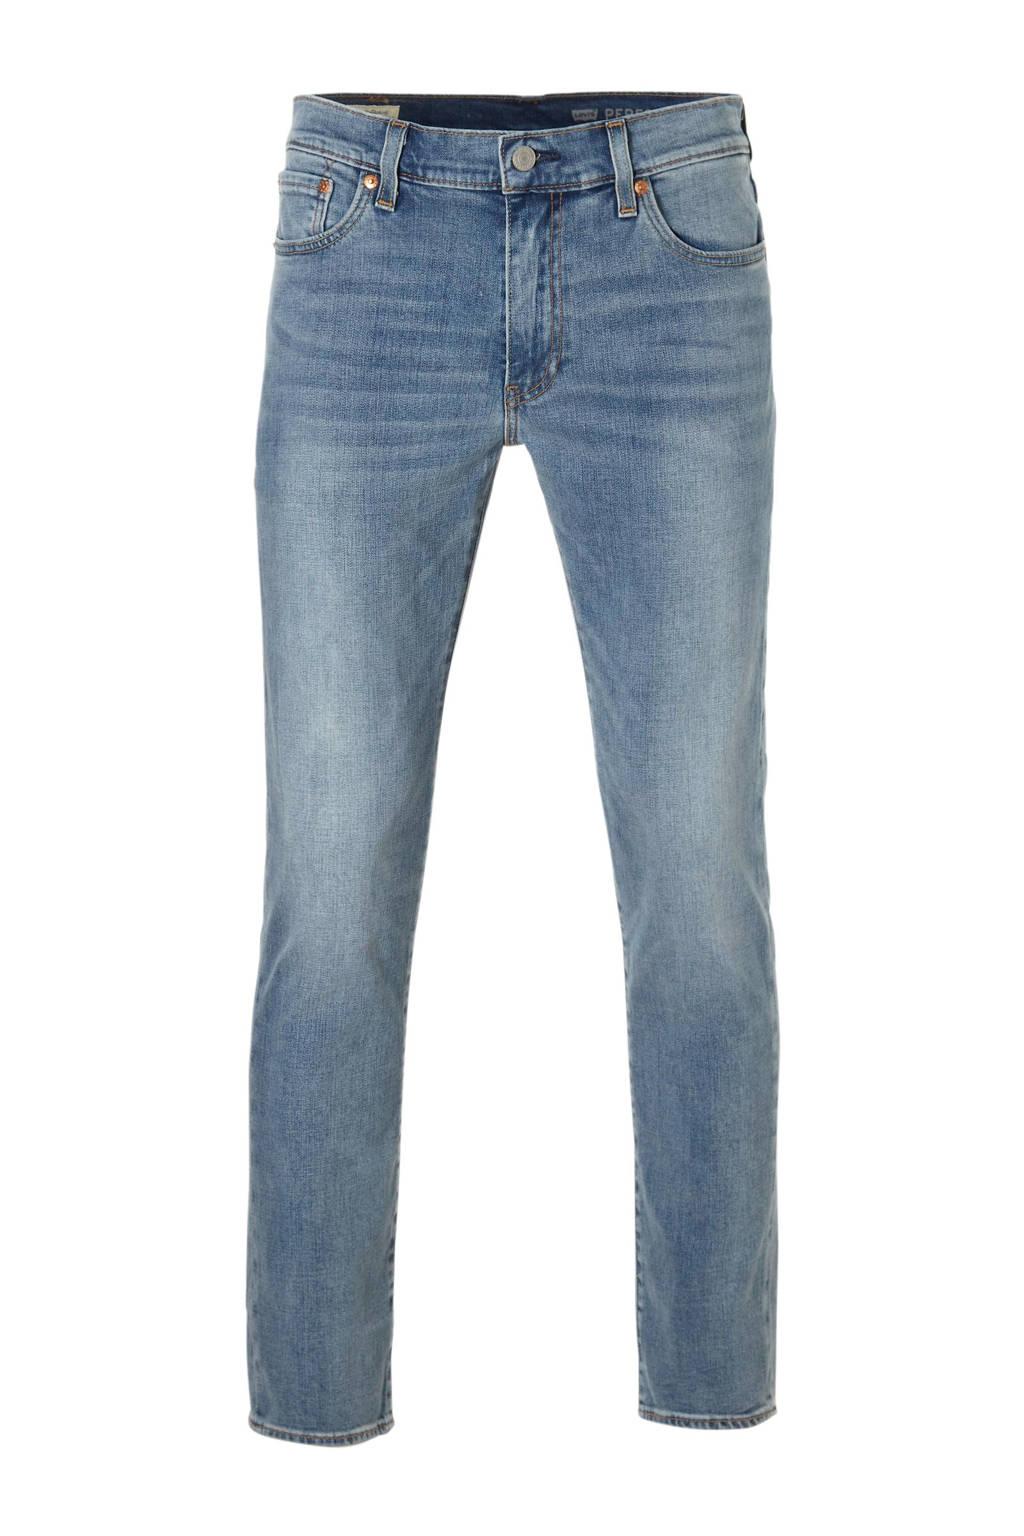 Levi's 511 slim fit jeans, Light denim